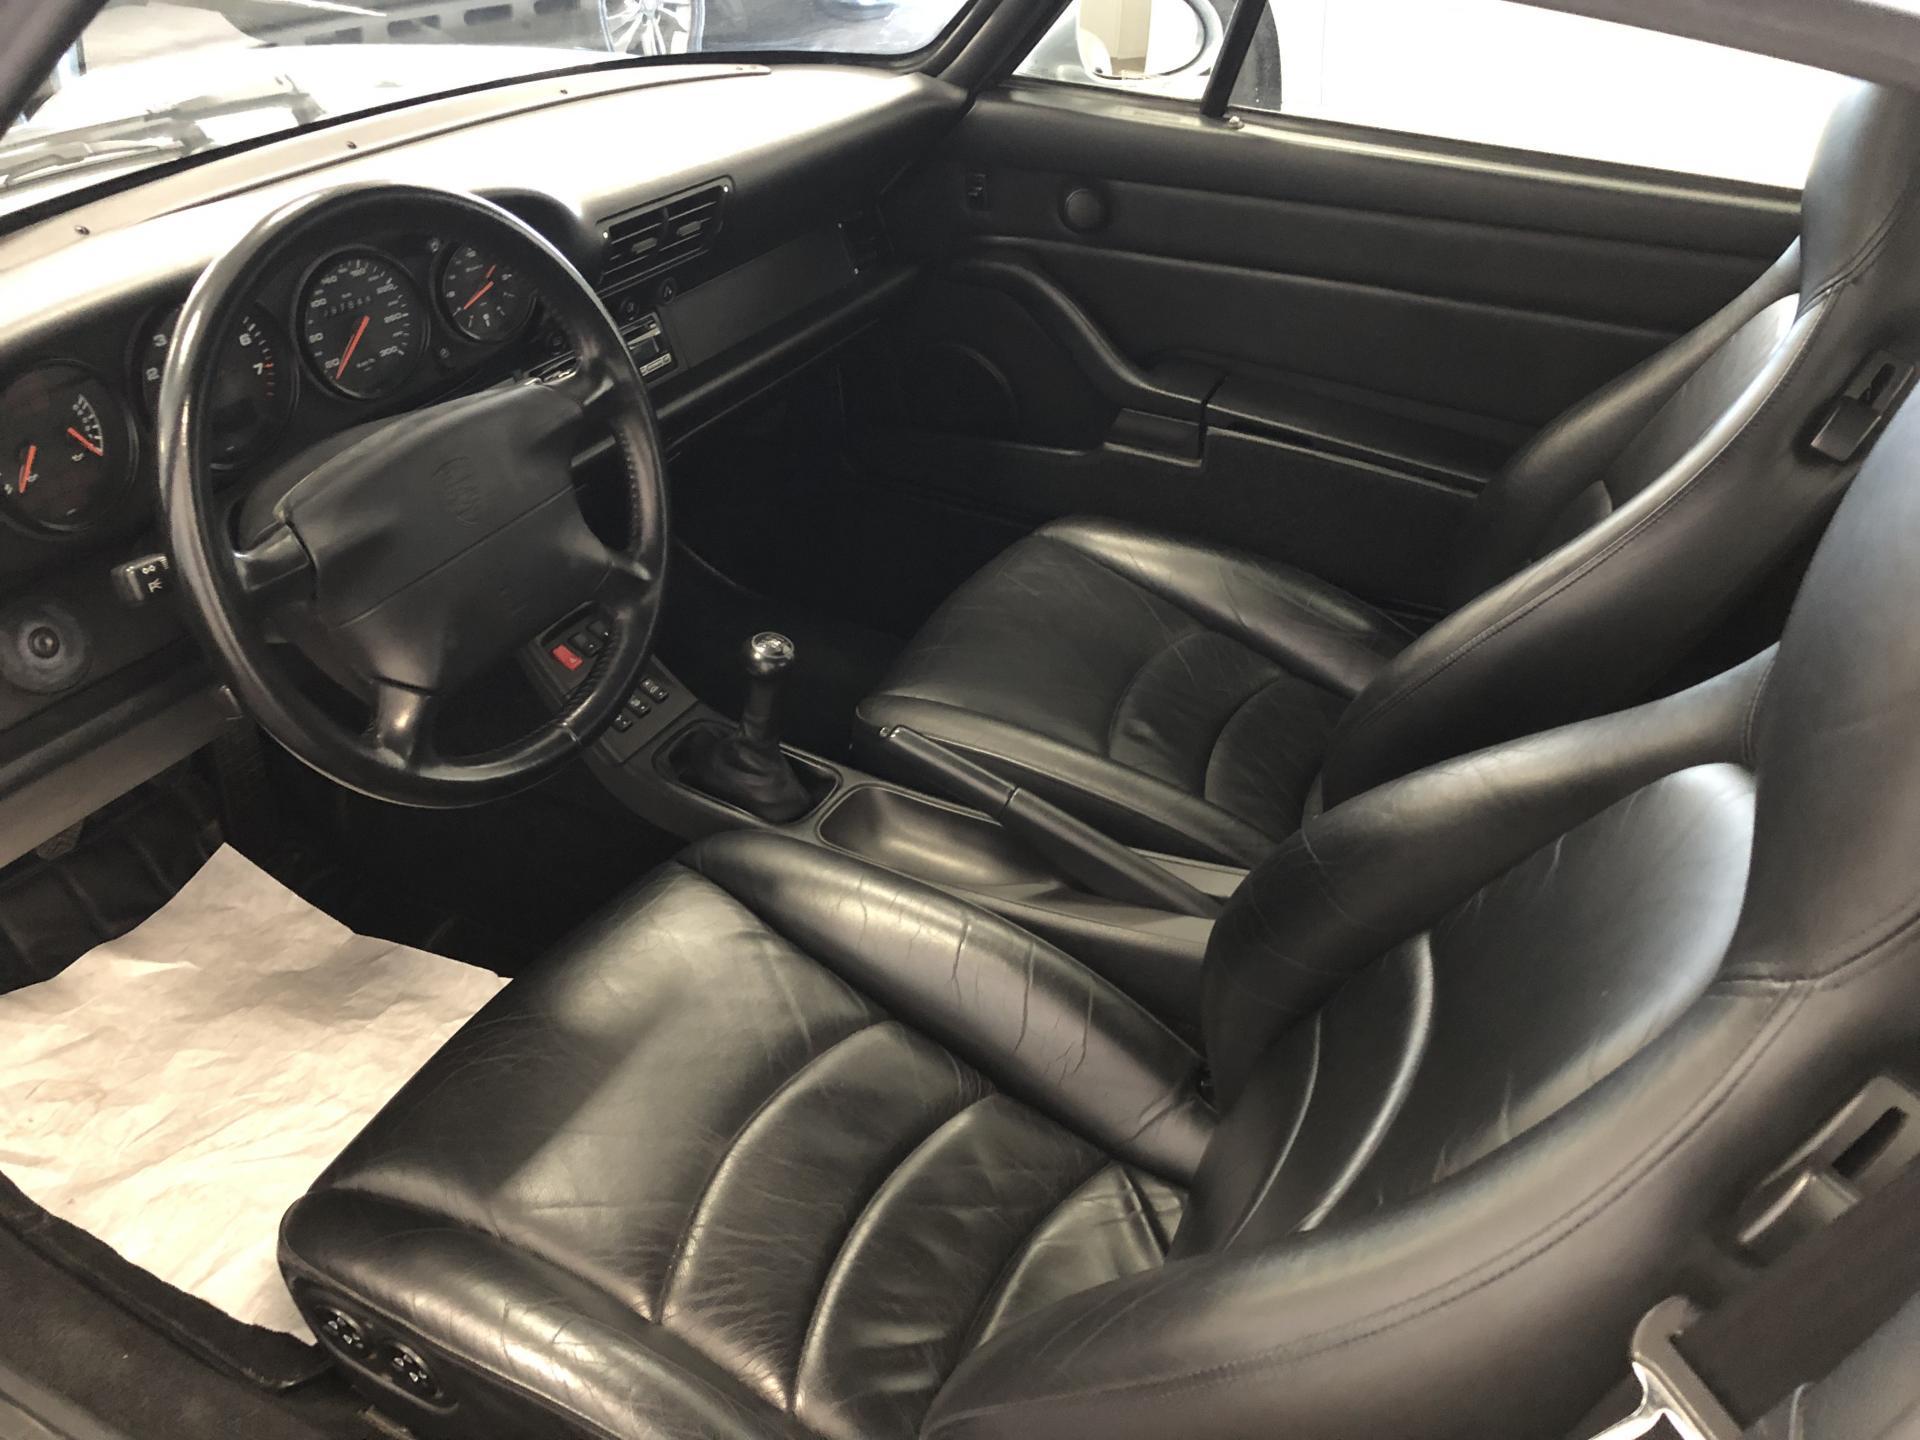 Porsche 993 272 ch Carrera (Porsche 993)